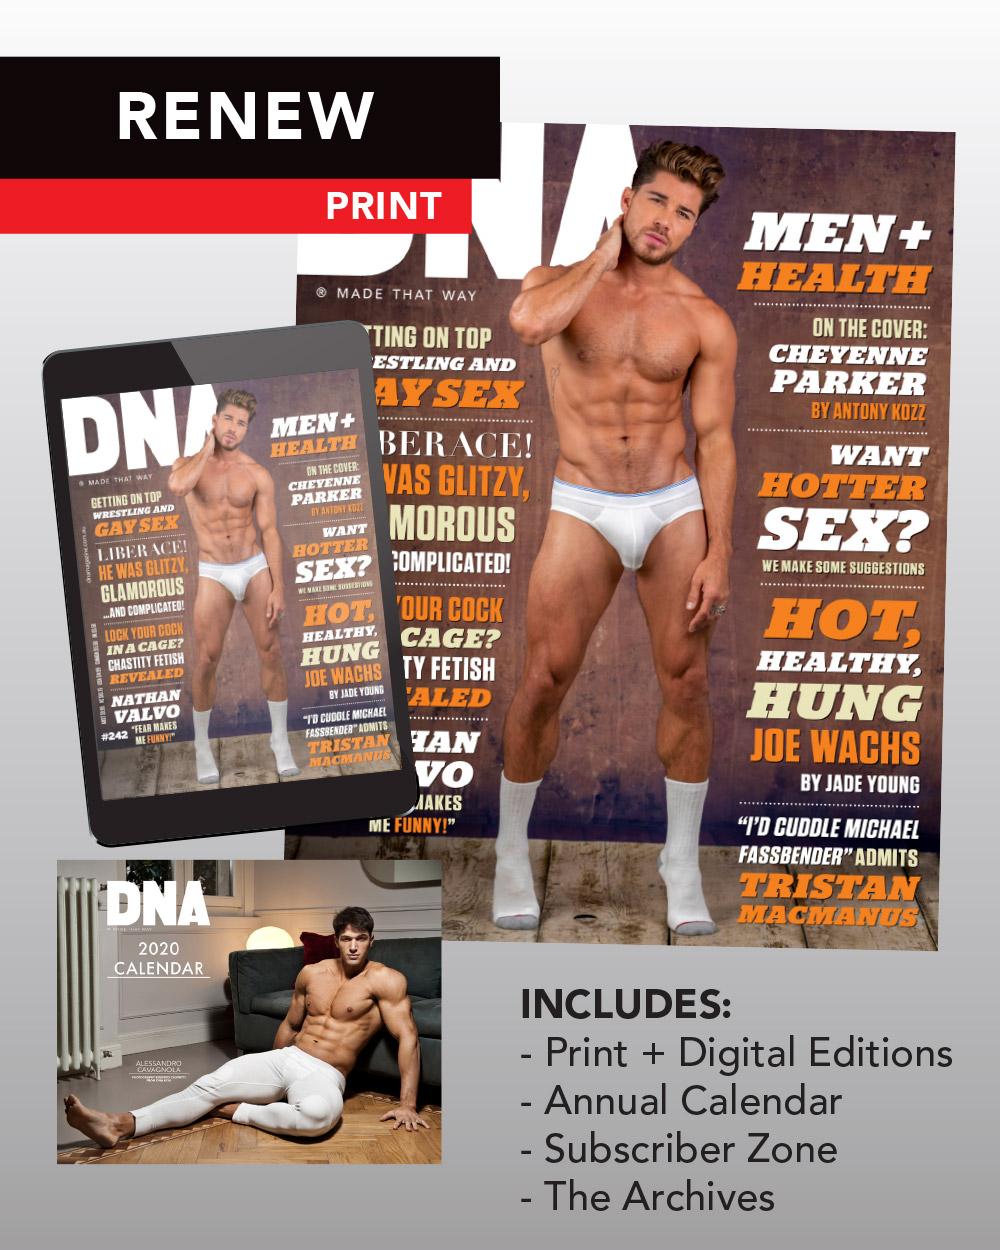 242_Renew-Print-Feature